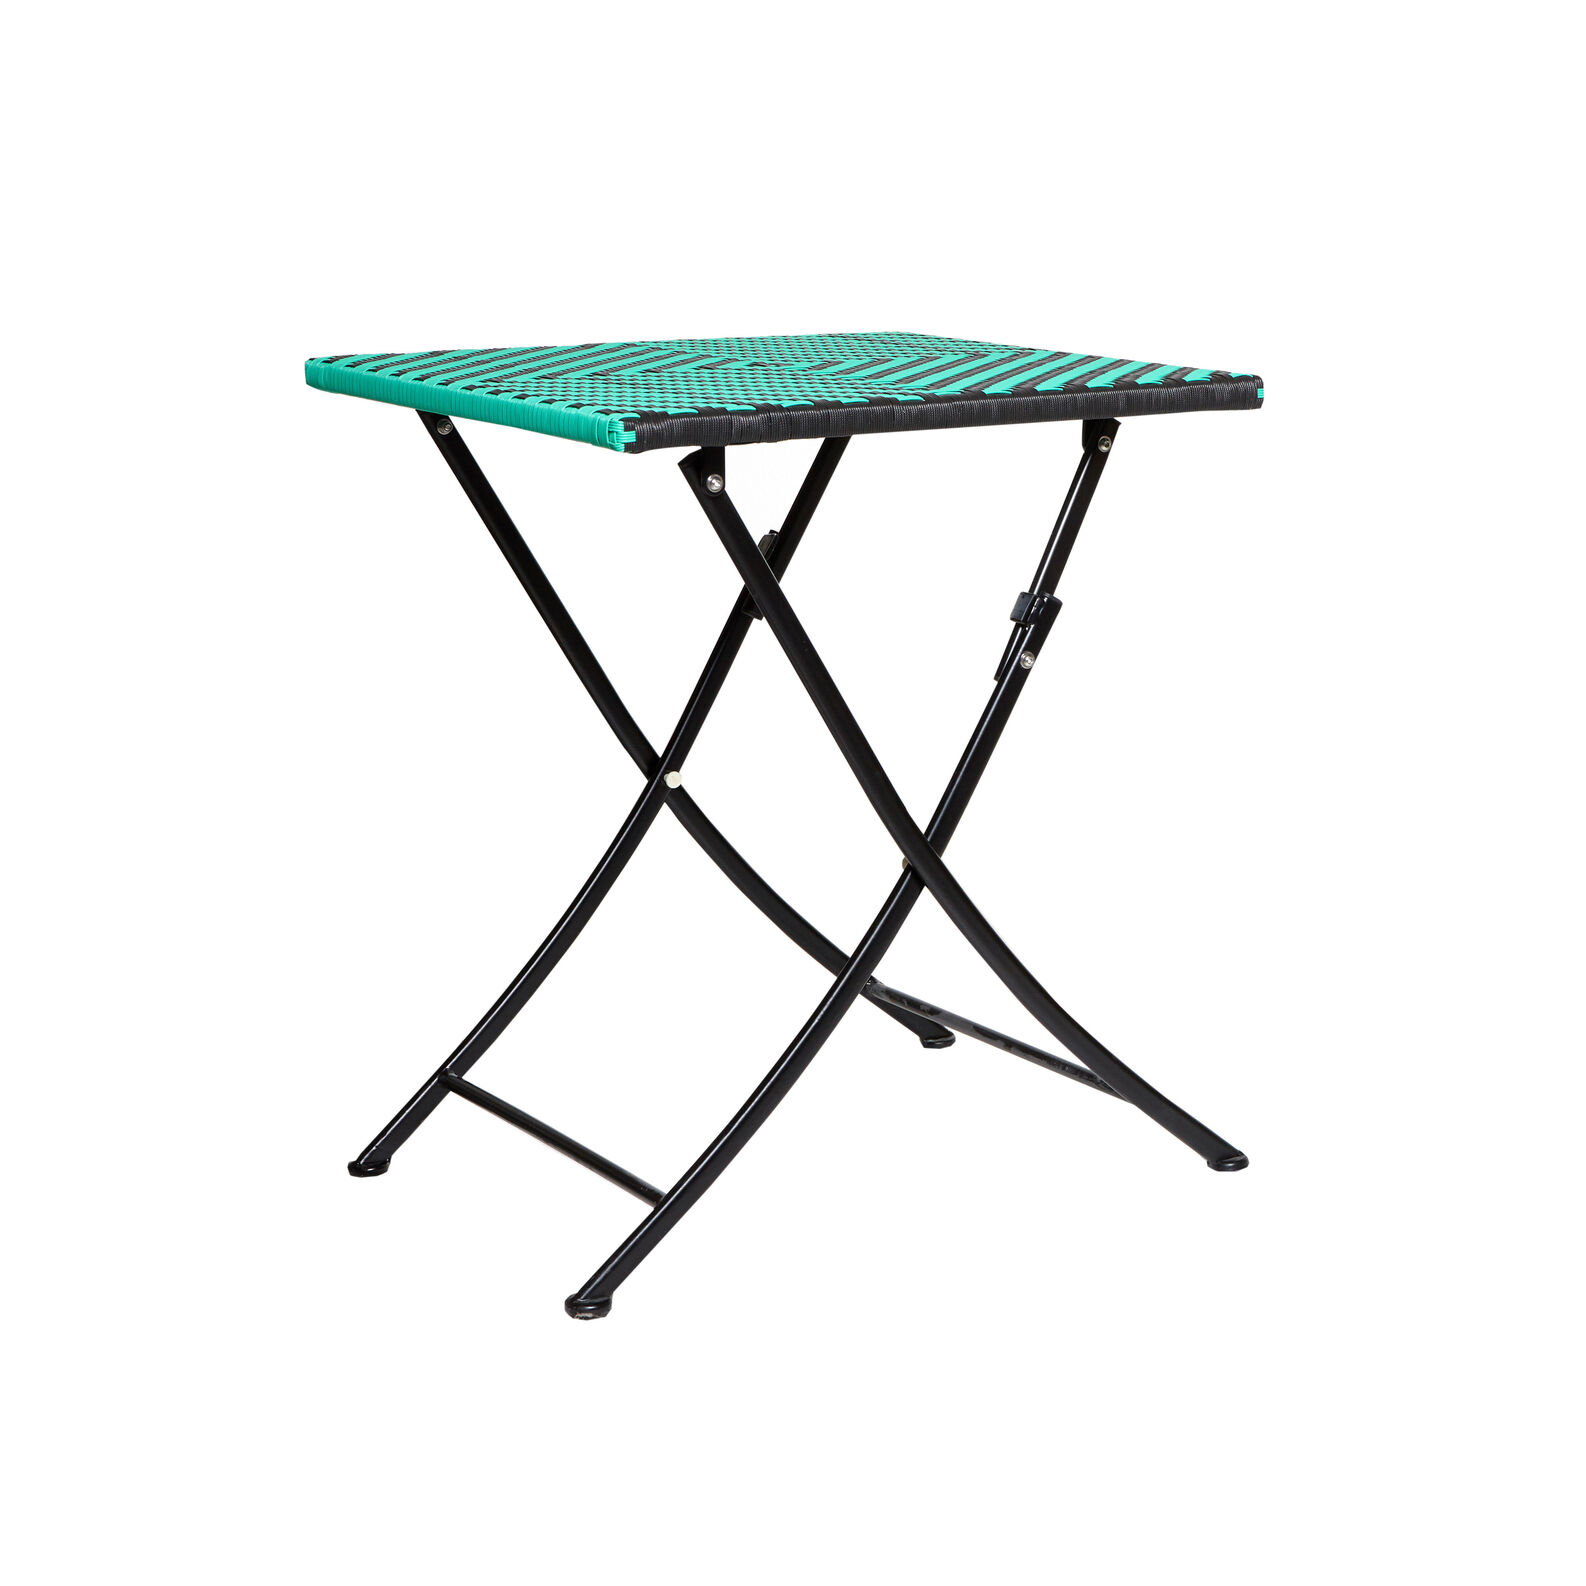 Playaparadiso folding table in polyrattan and aluminium